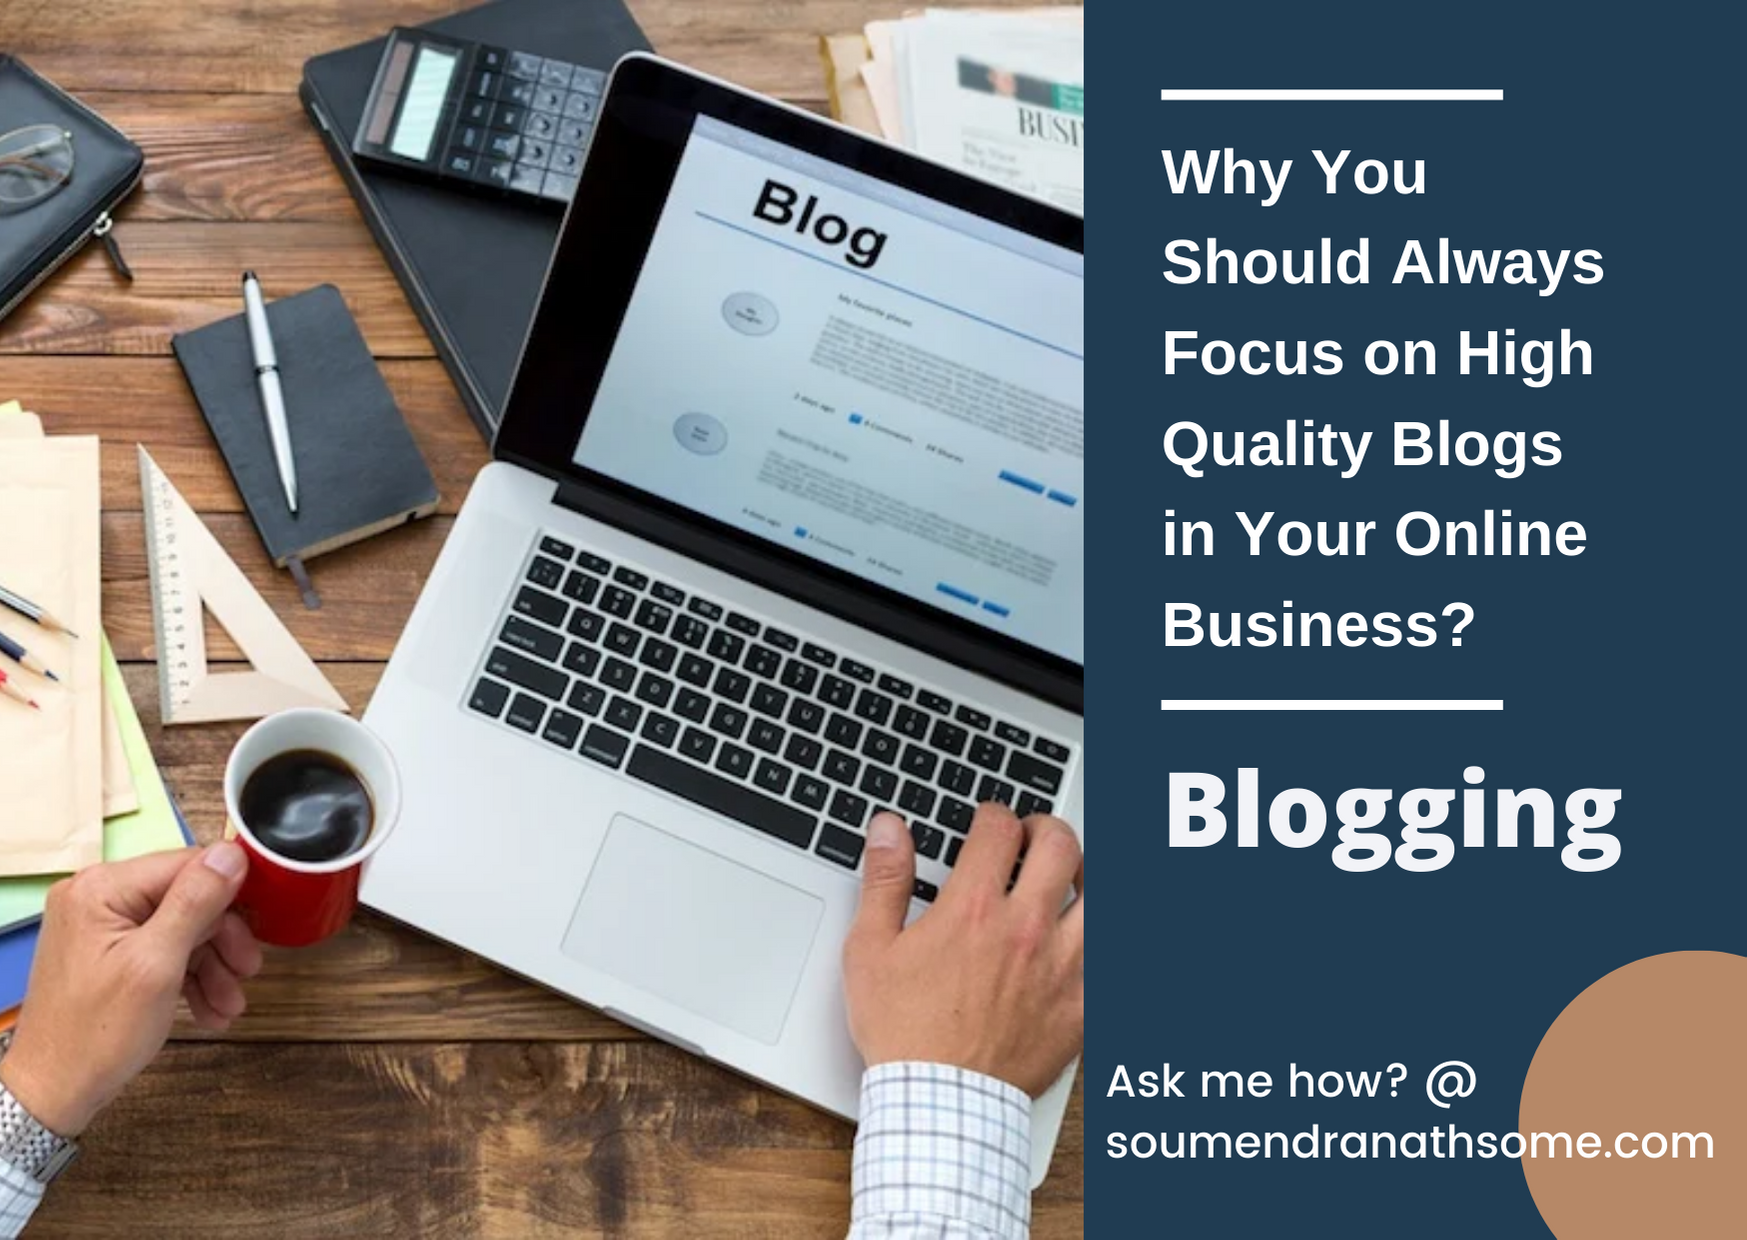 blogging-digital-marketing-search-engine-ranking-insight-caja